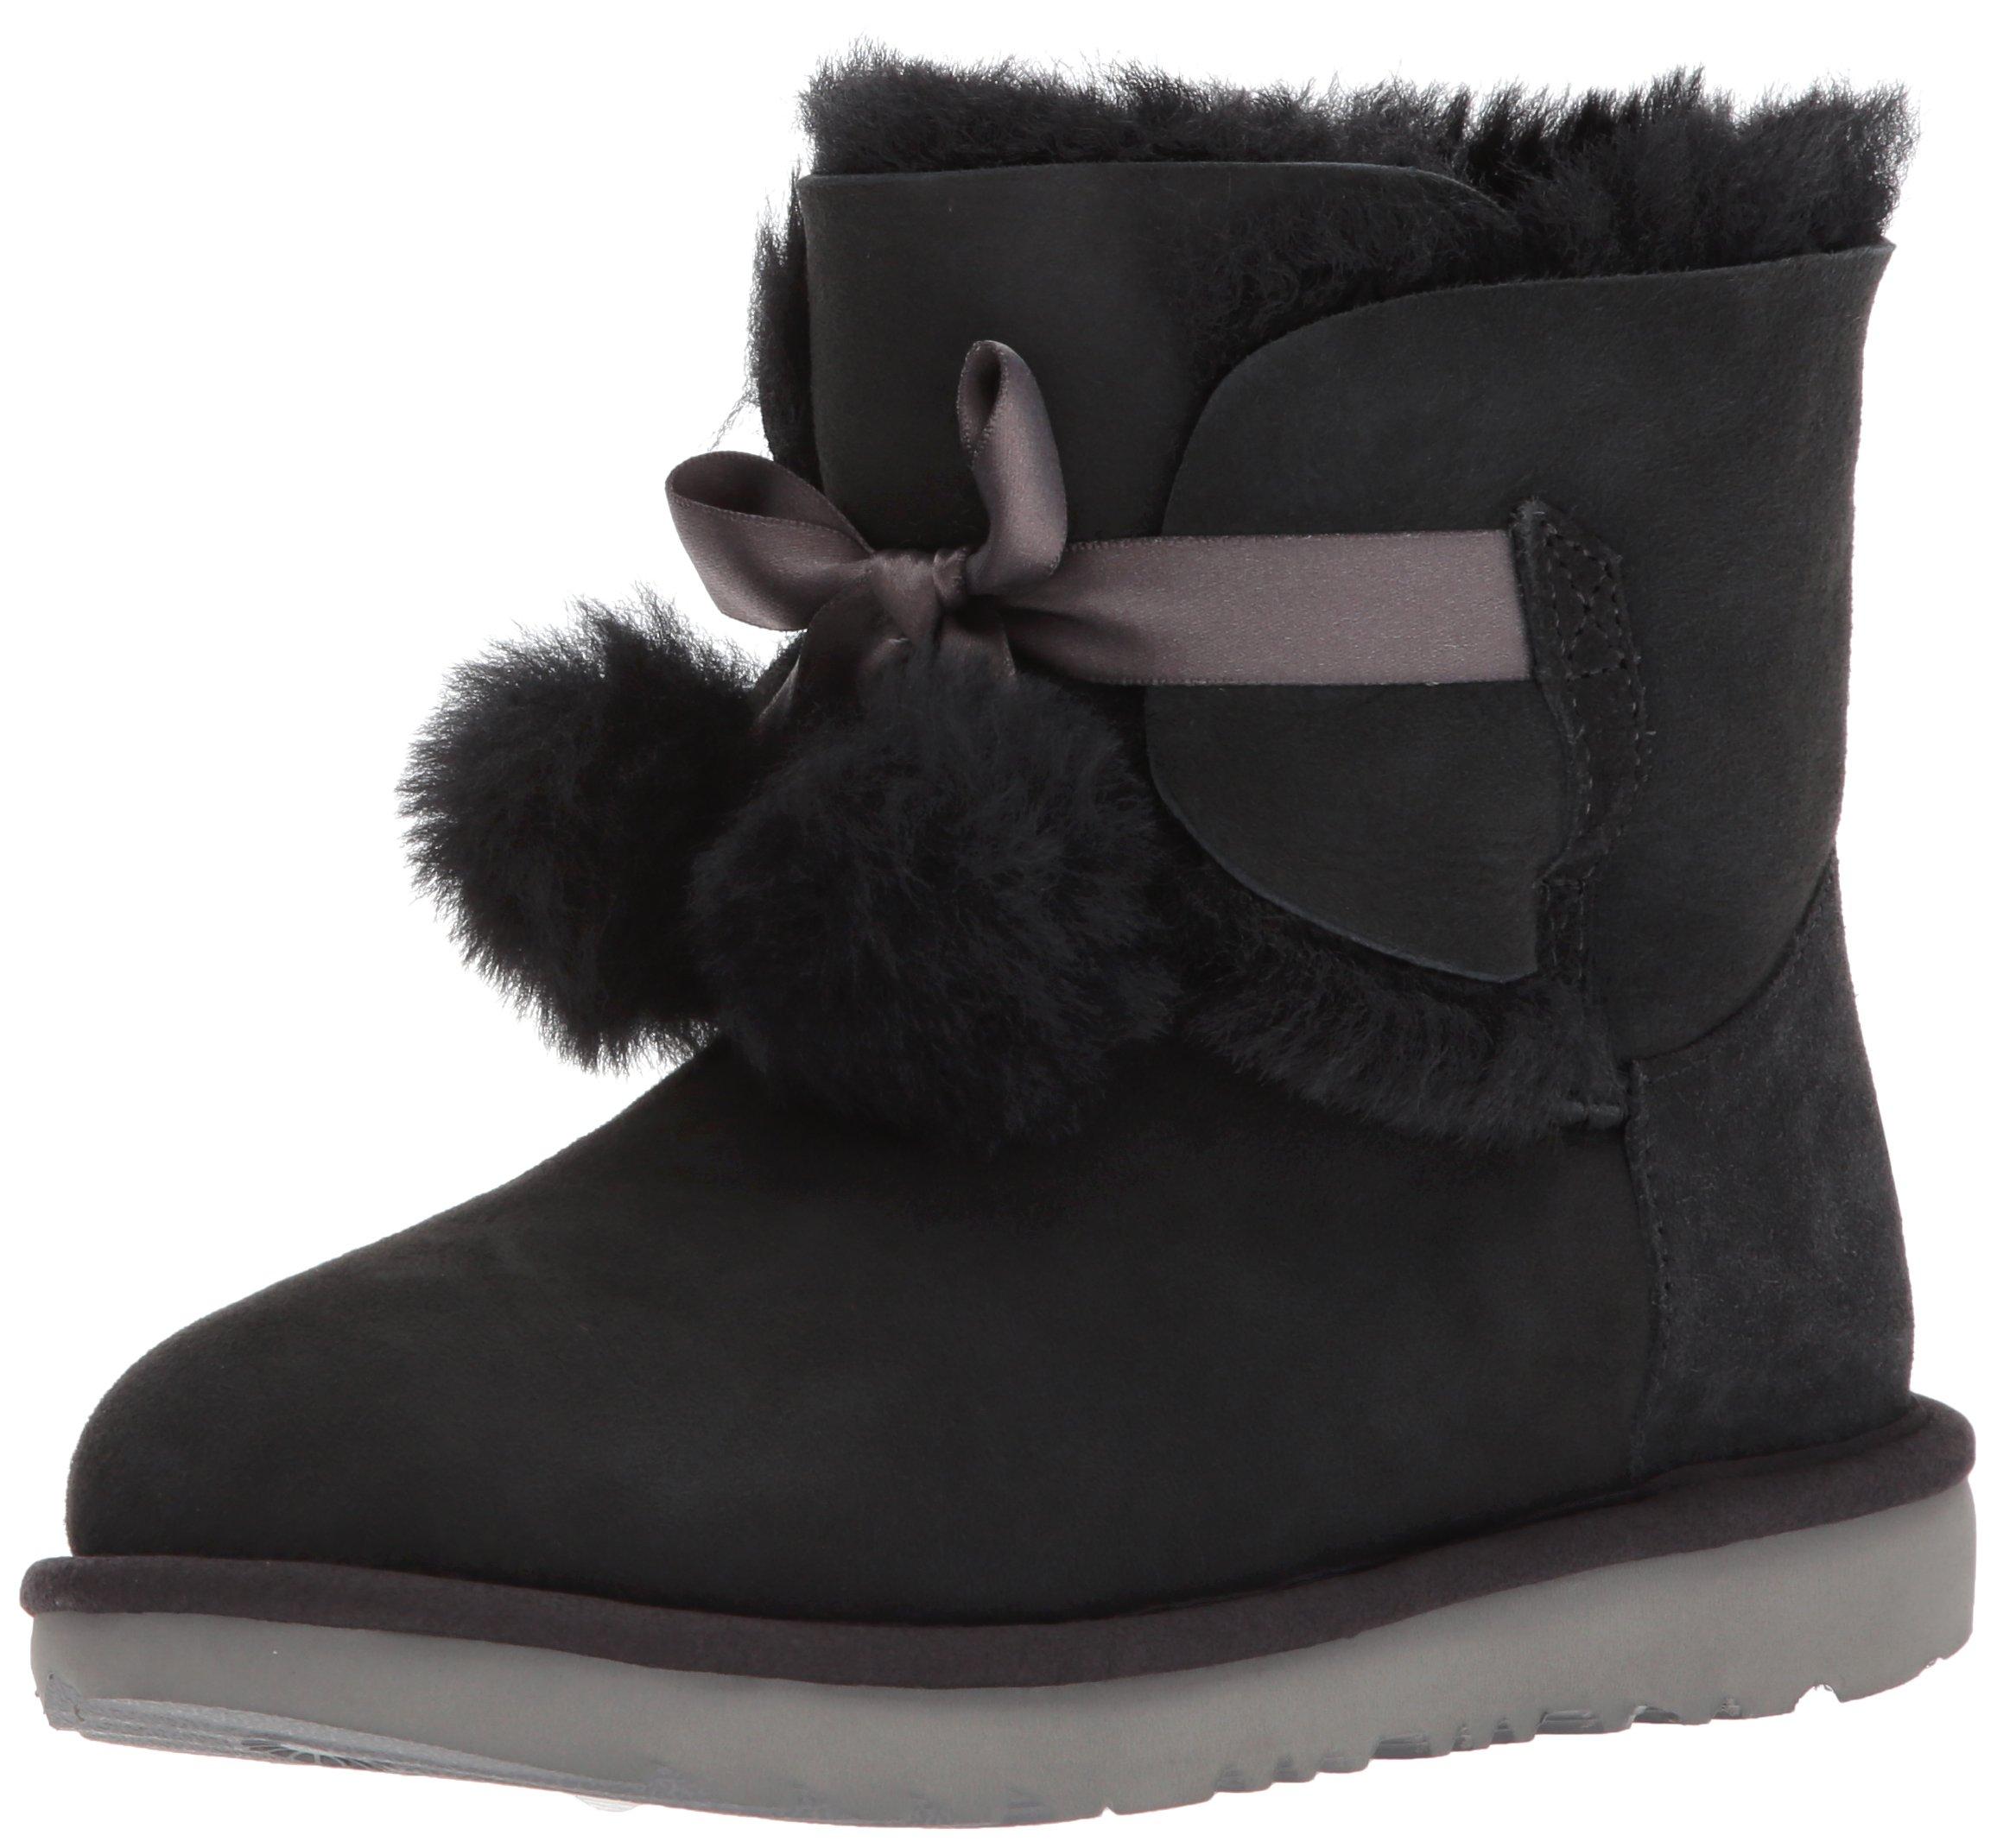 UGG Girls K Gita Pull-on Boot, Black, 5 M US Big Kid